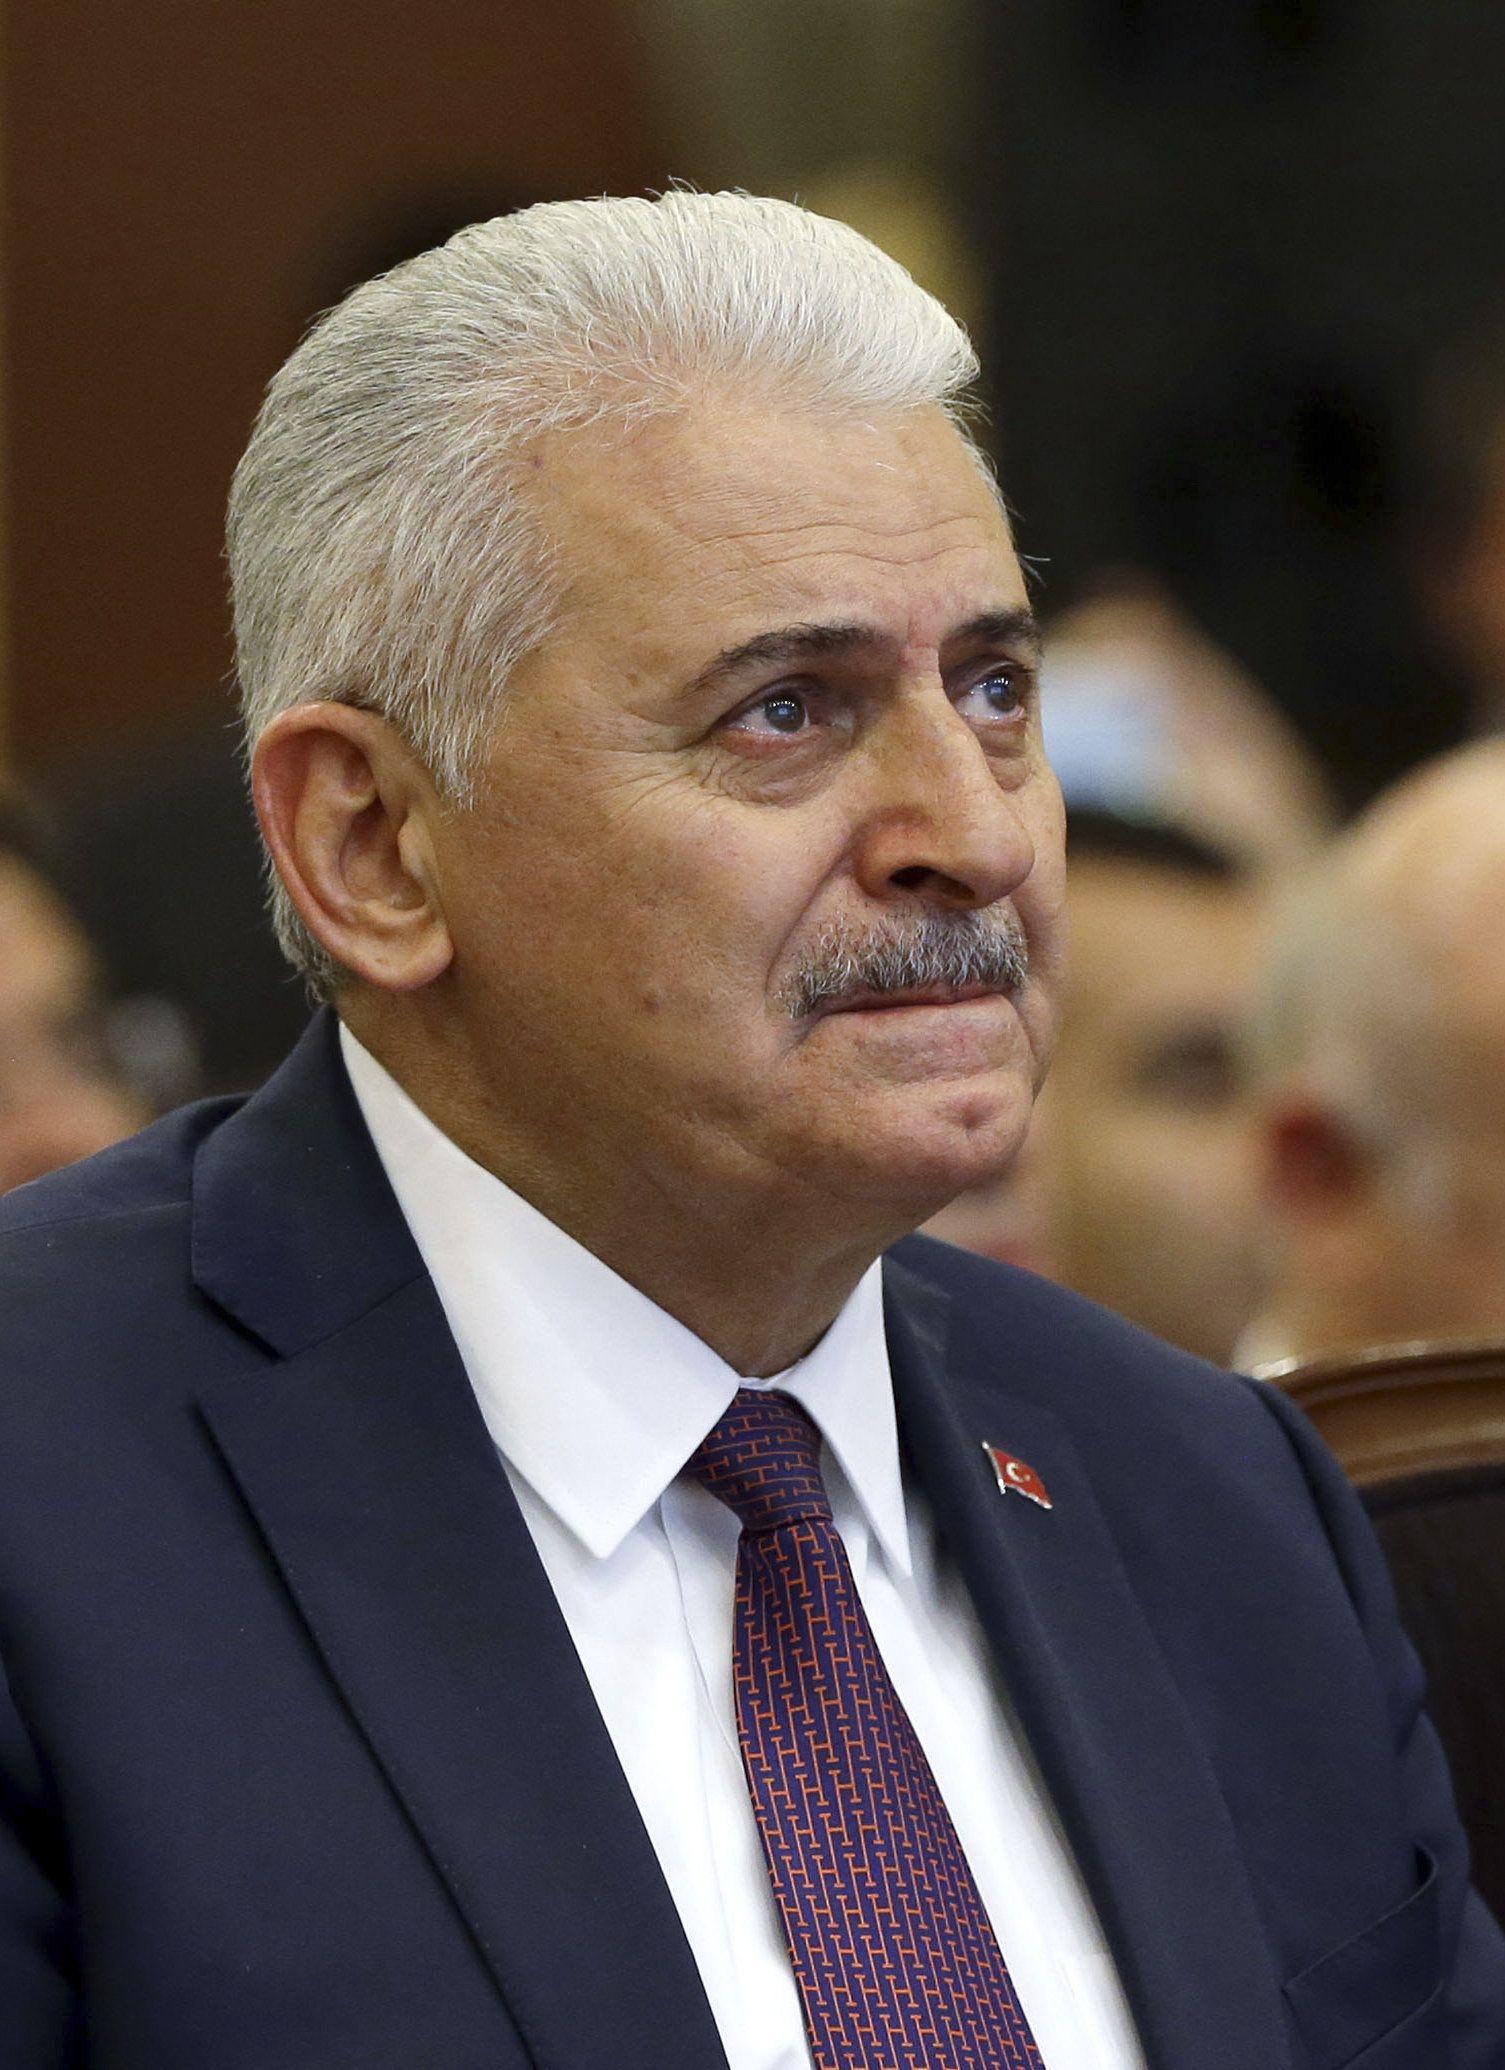 Turkei/ Binali Yildirim